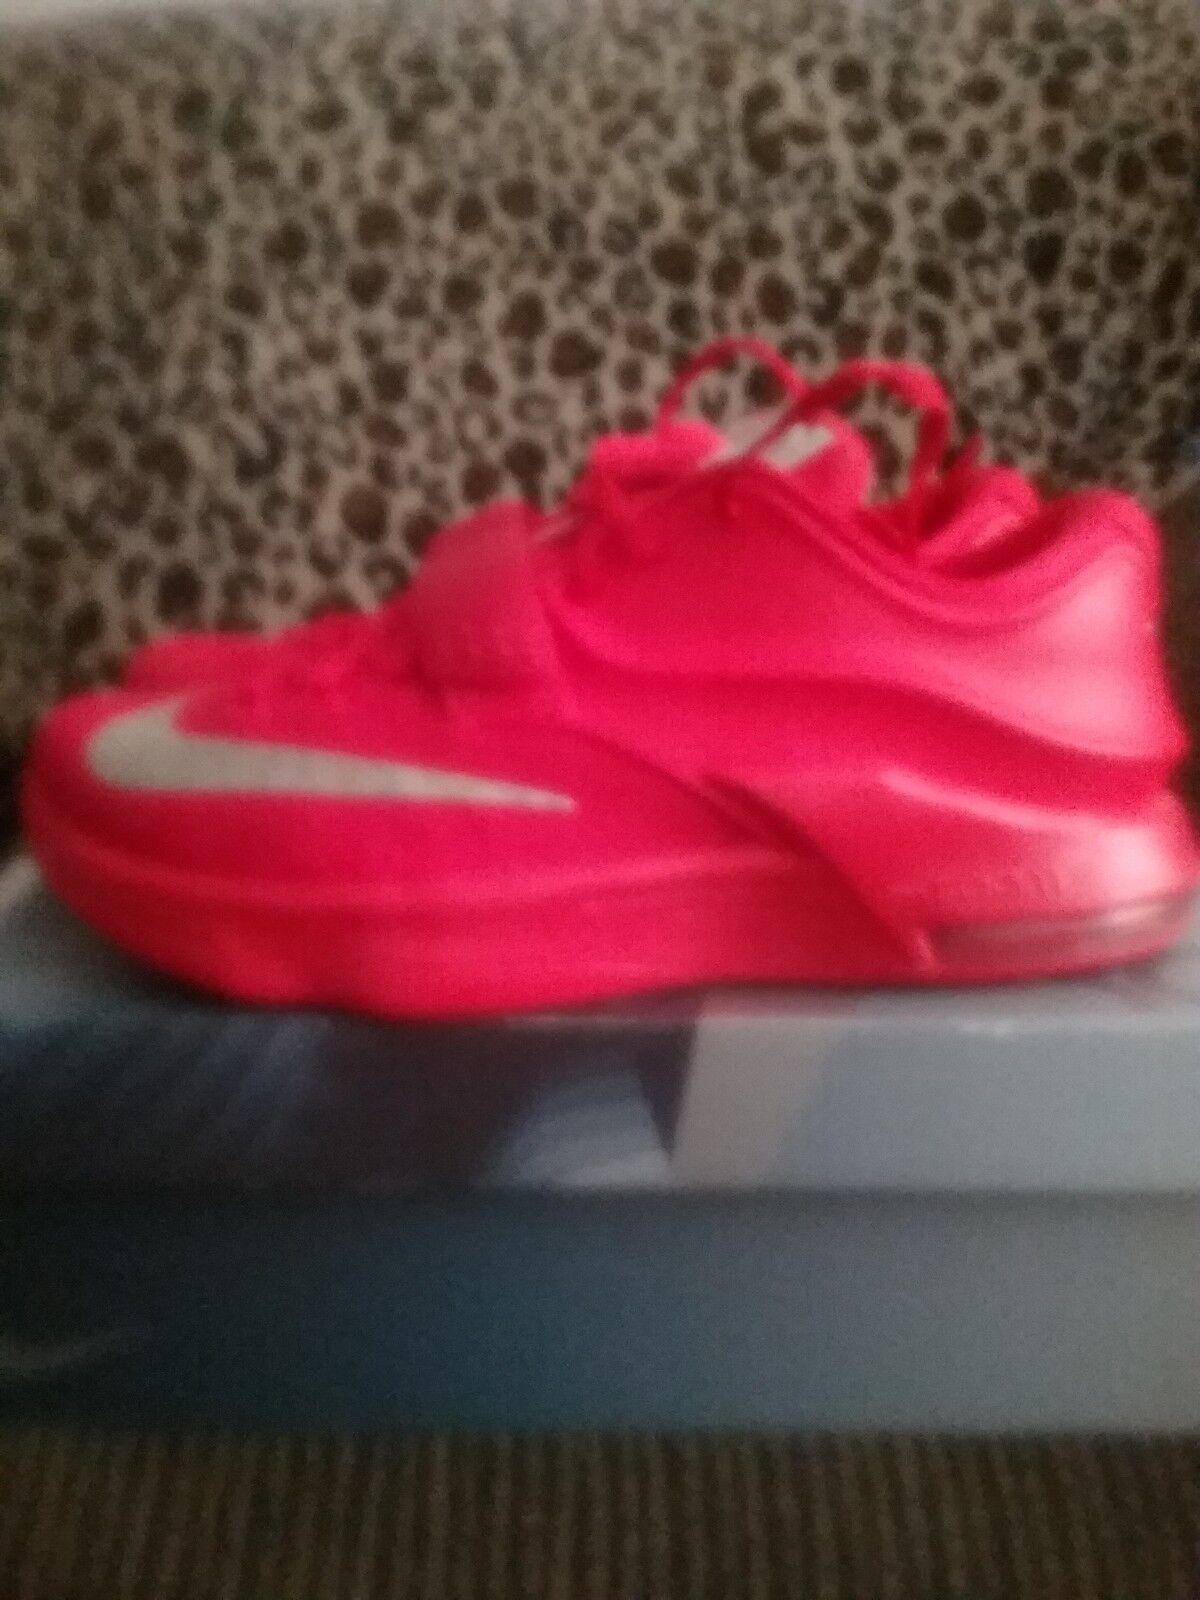 Nike kd vii 7 global game 10.5 Nerf Weatherman WTKD Red October yeezy